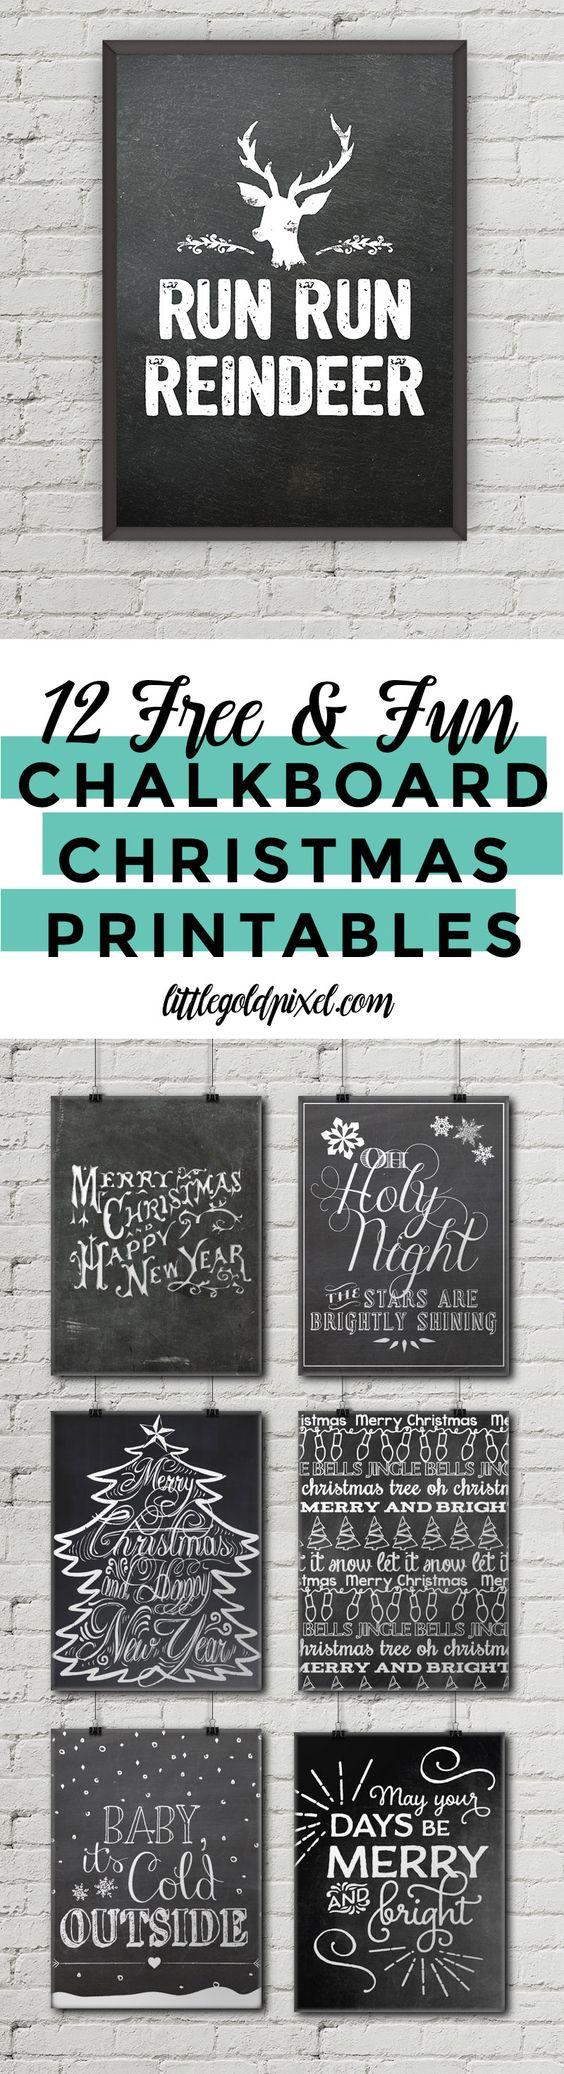 12 Free Chalkboard Christmas Printables • Little Gold Pixel